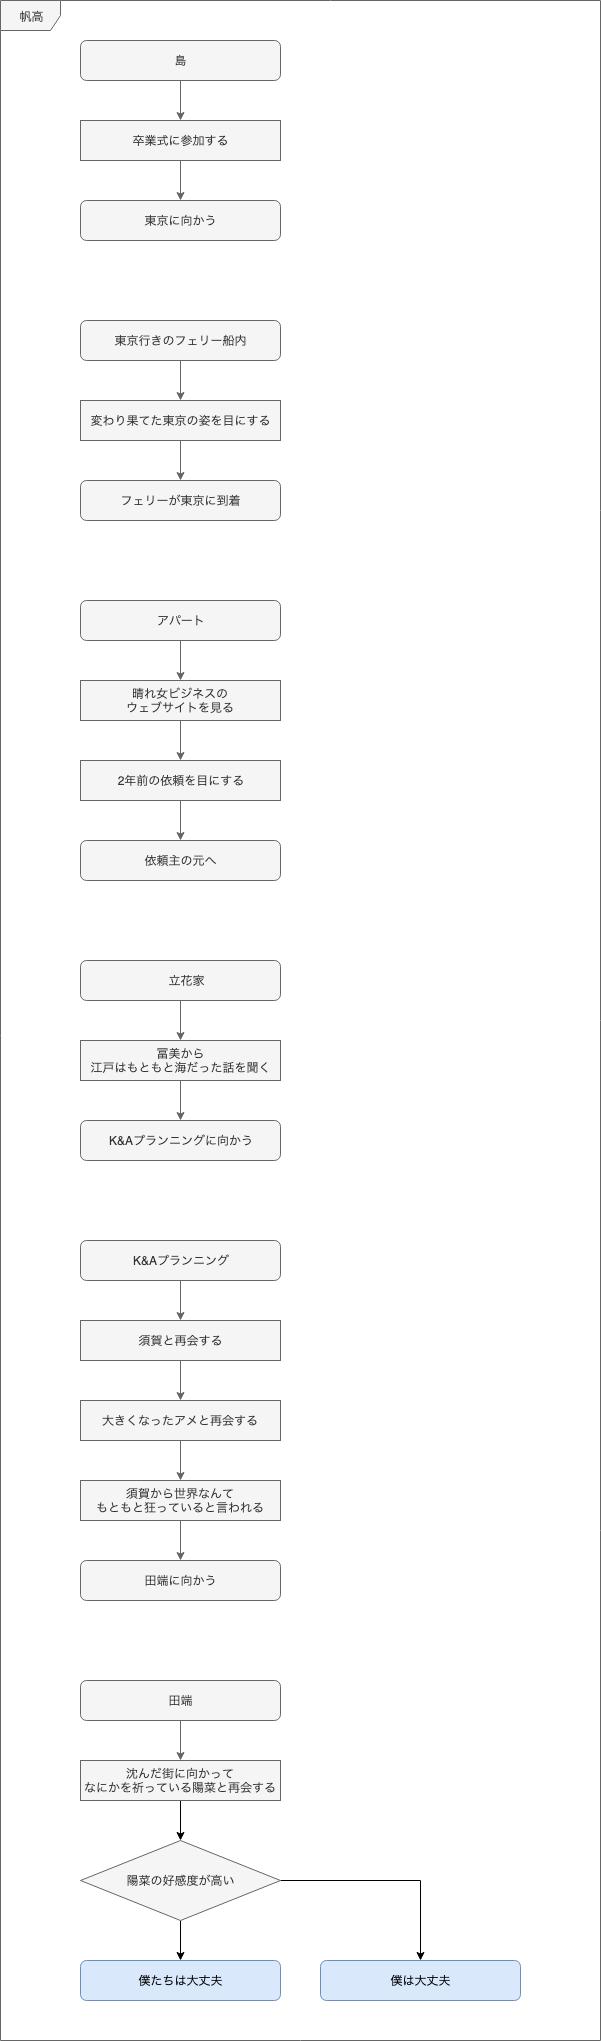 https://cdn-ak.f.st-hatena.com/images/fotolife/m/munieru_jp/20190913/20190913111816_original.png